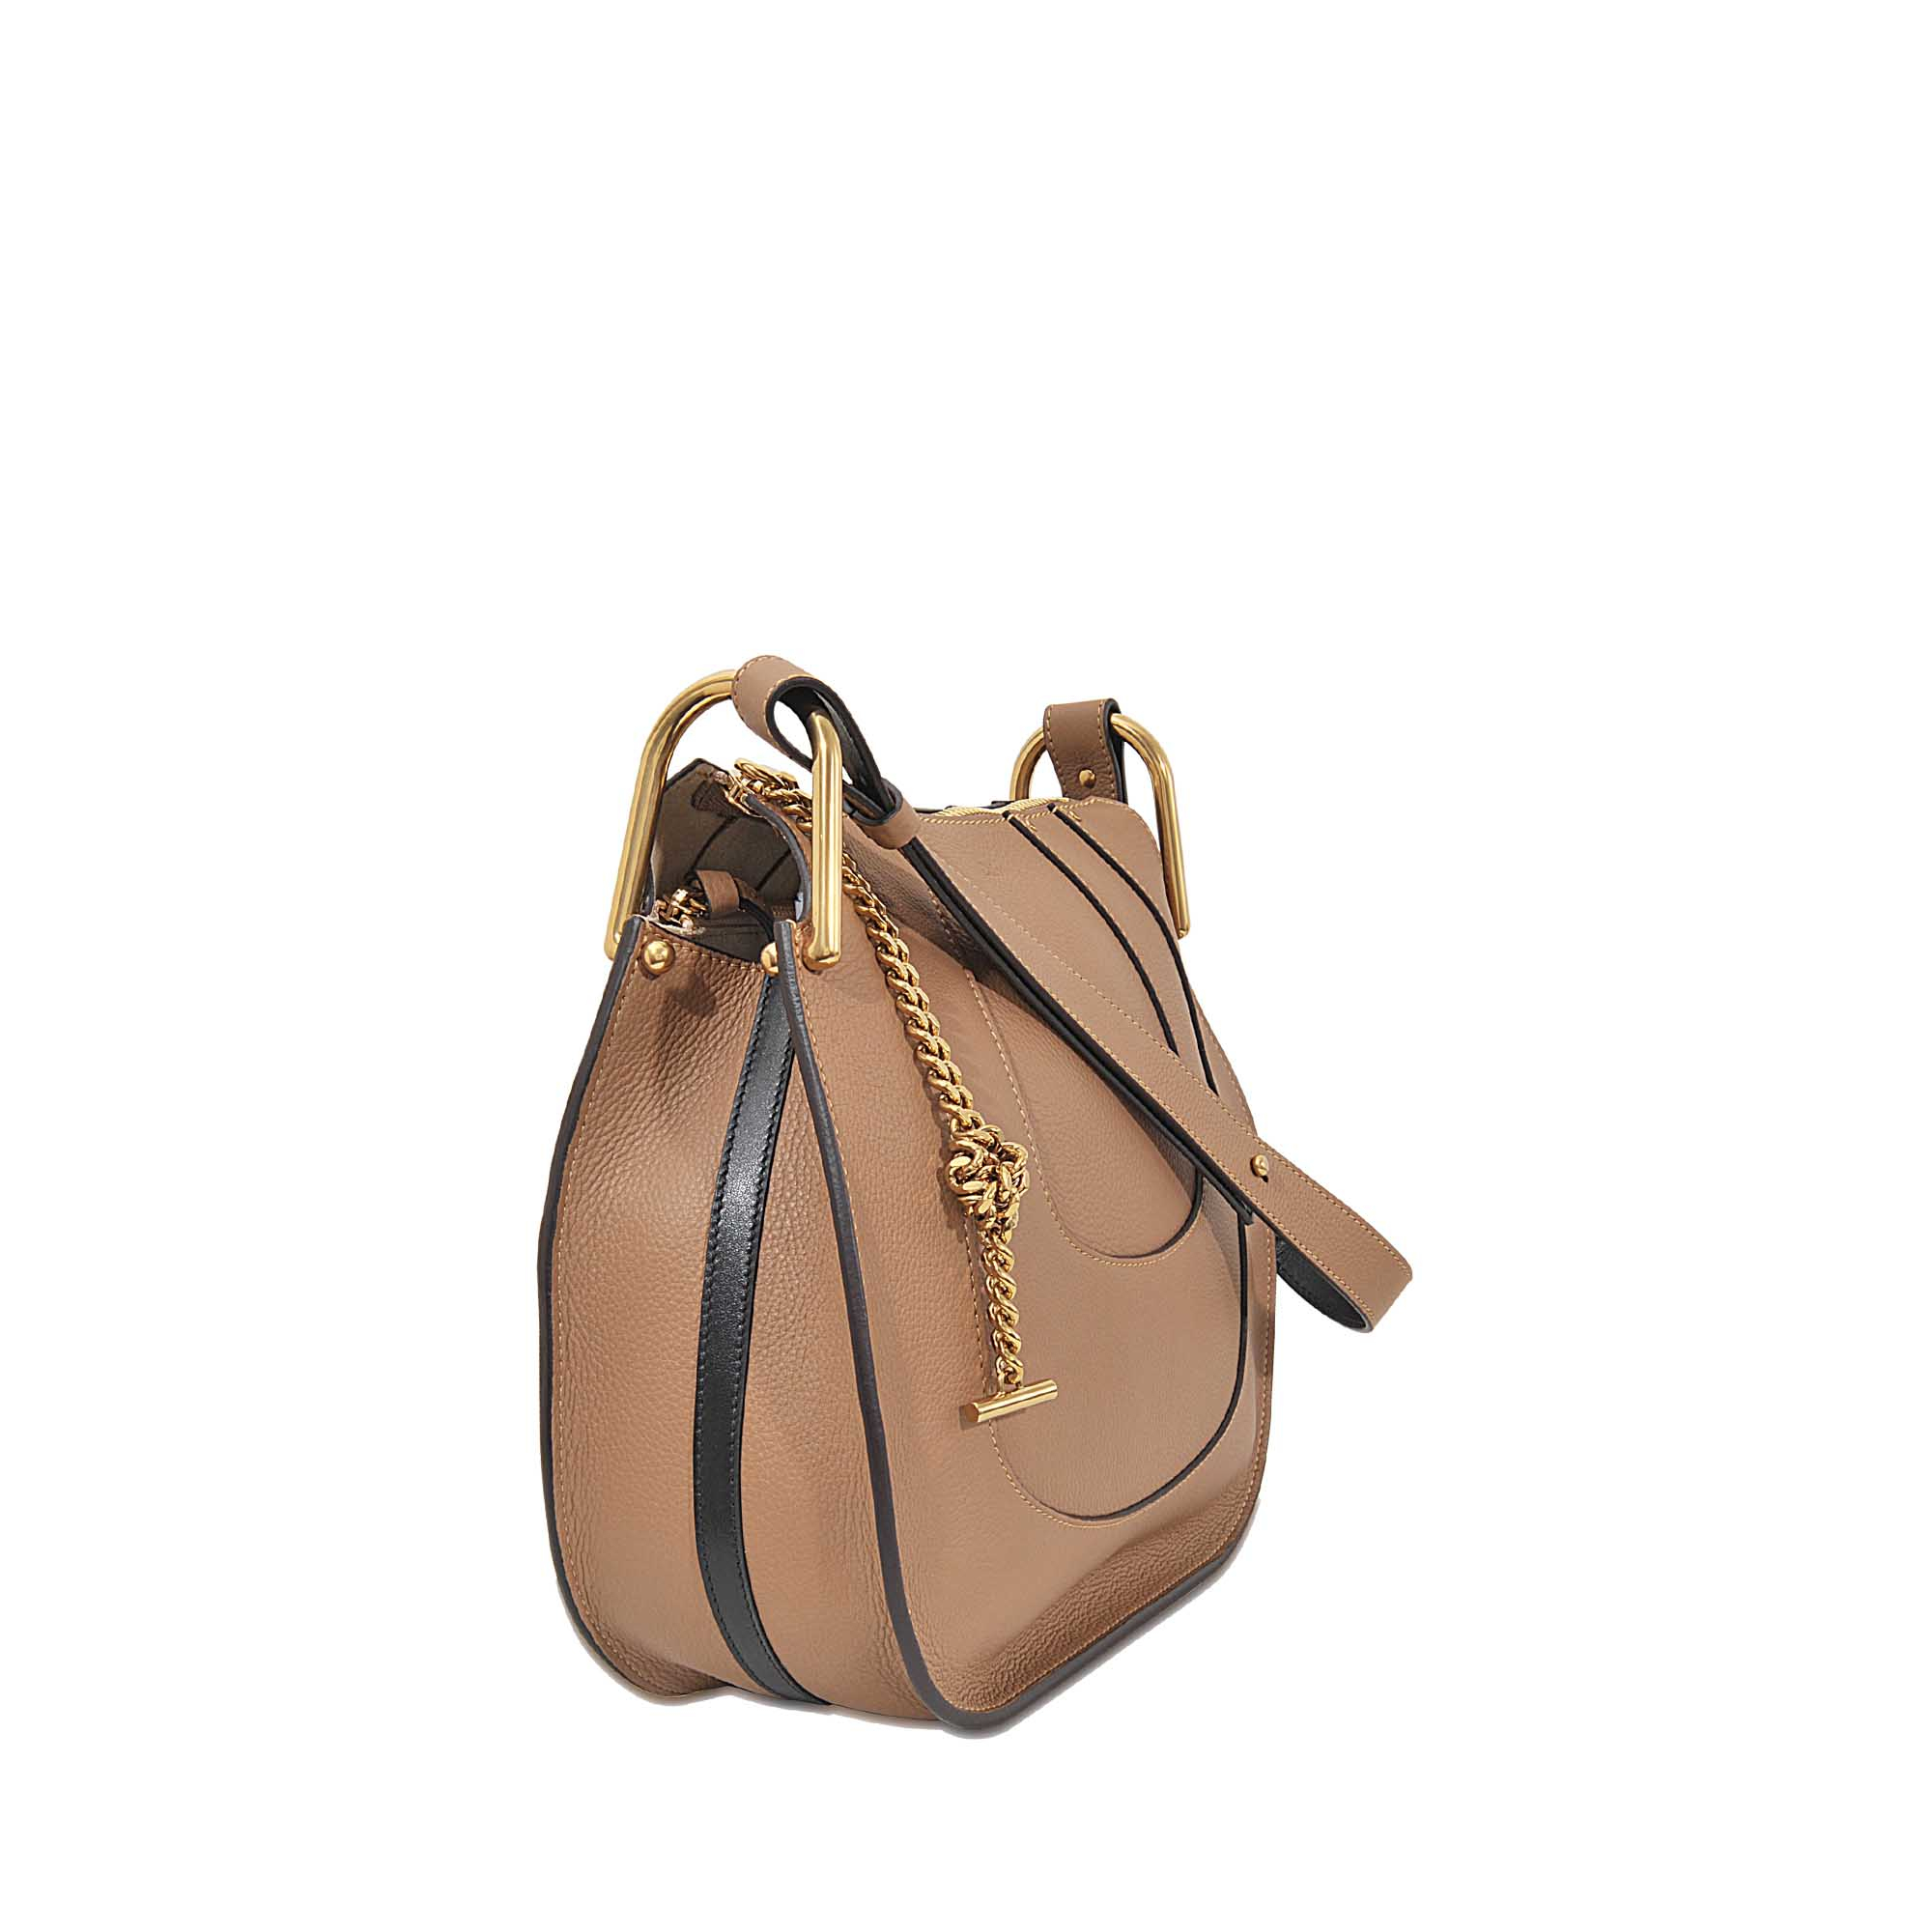 Authentic Chloe Paddington Long Wallet Bifold Black Patent Leather